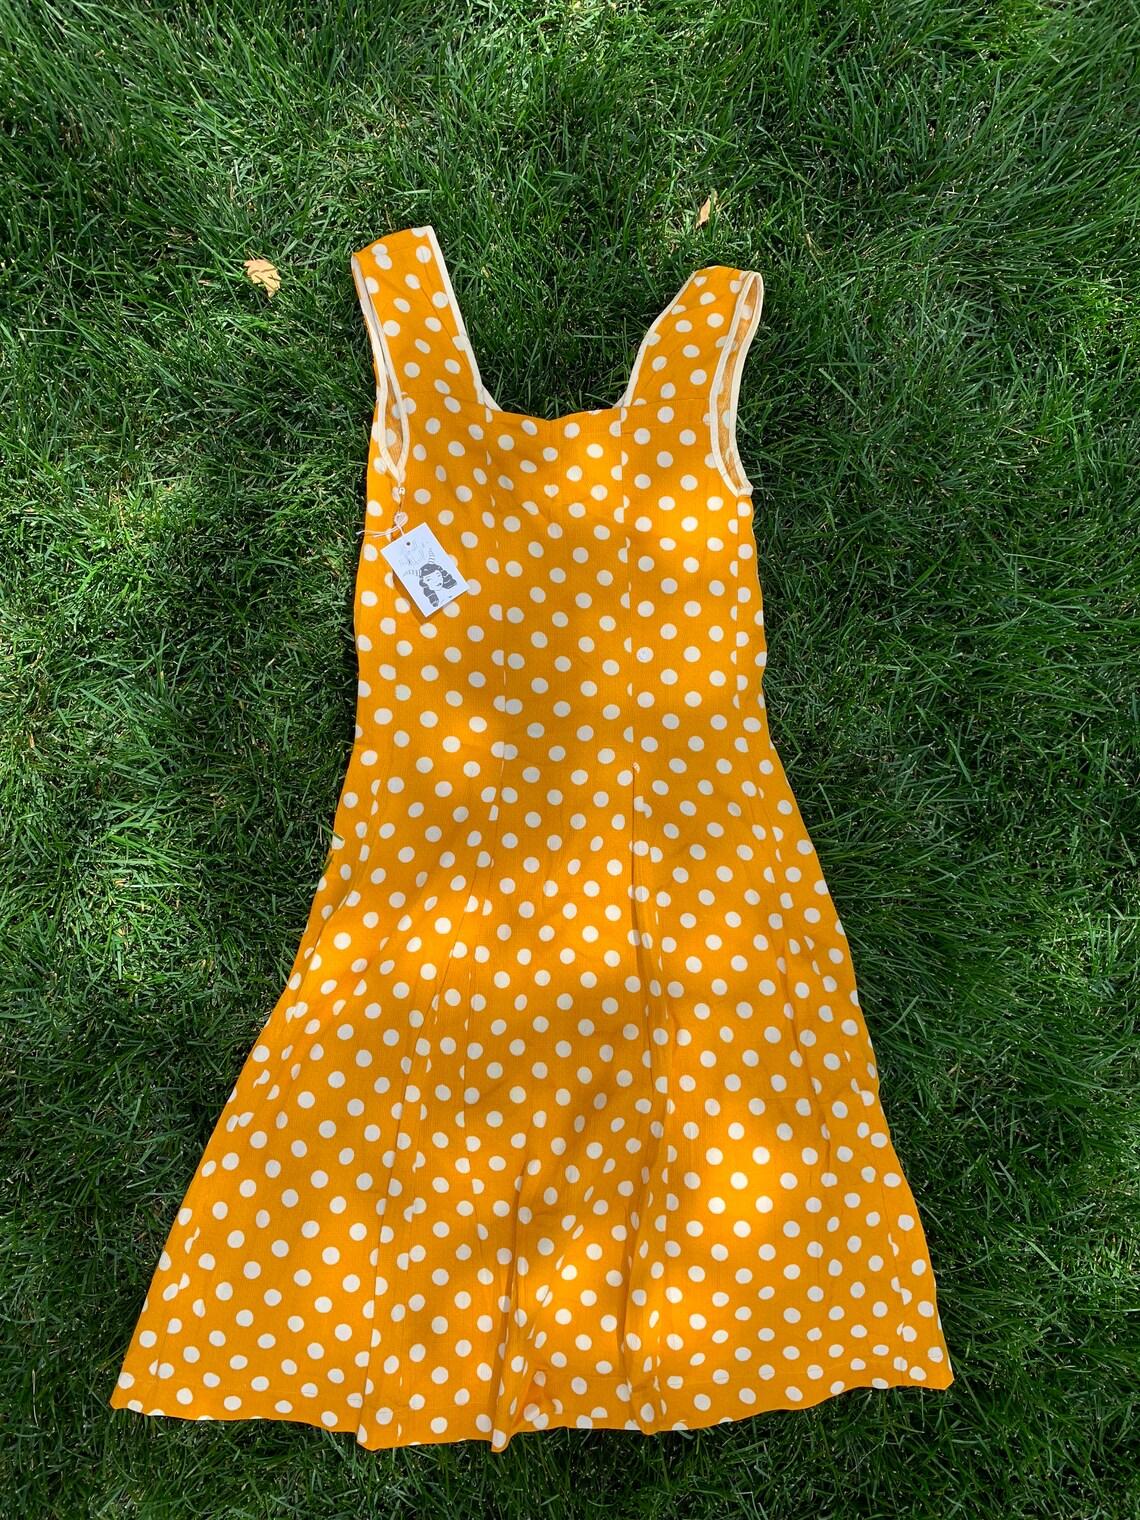 1960s Mod Yellow Polka Dot Designer A-Line Tank Dress